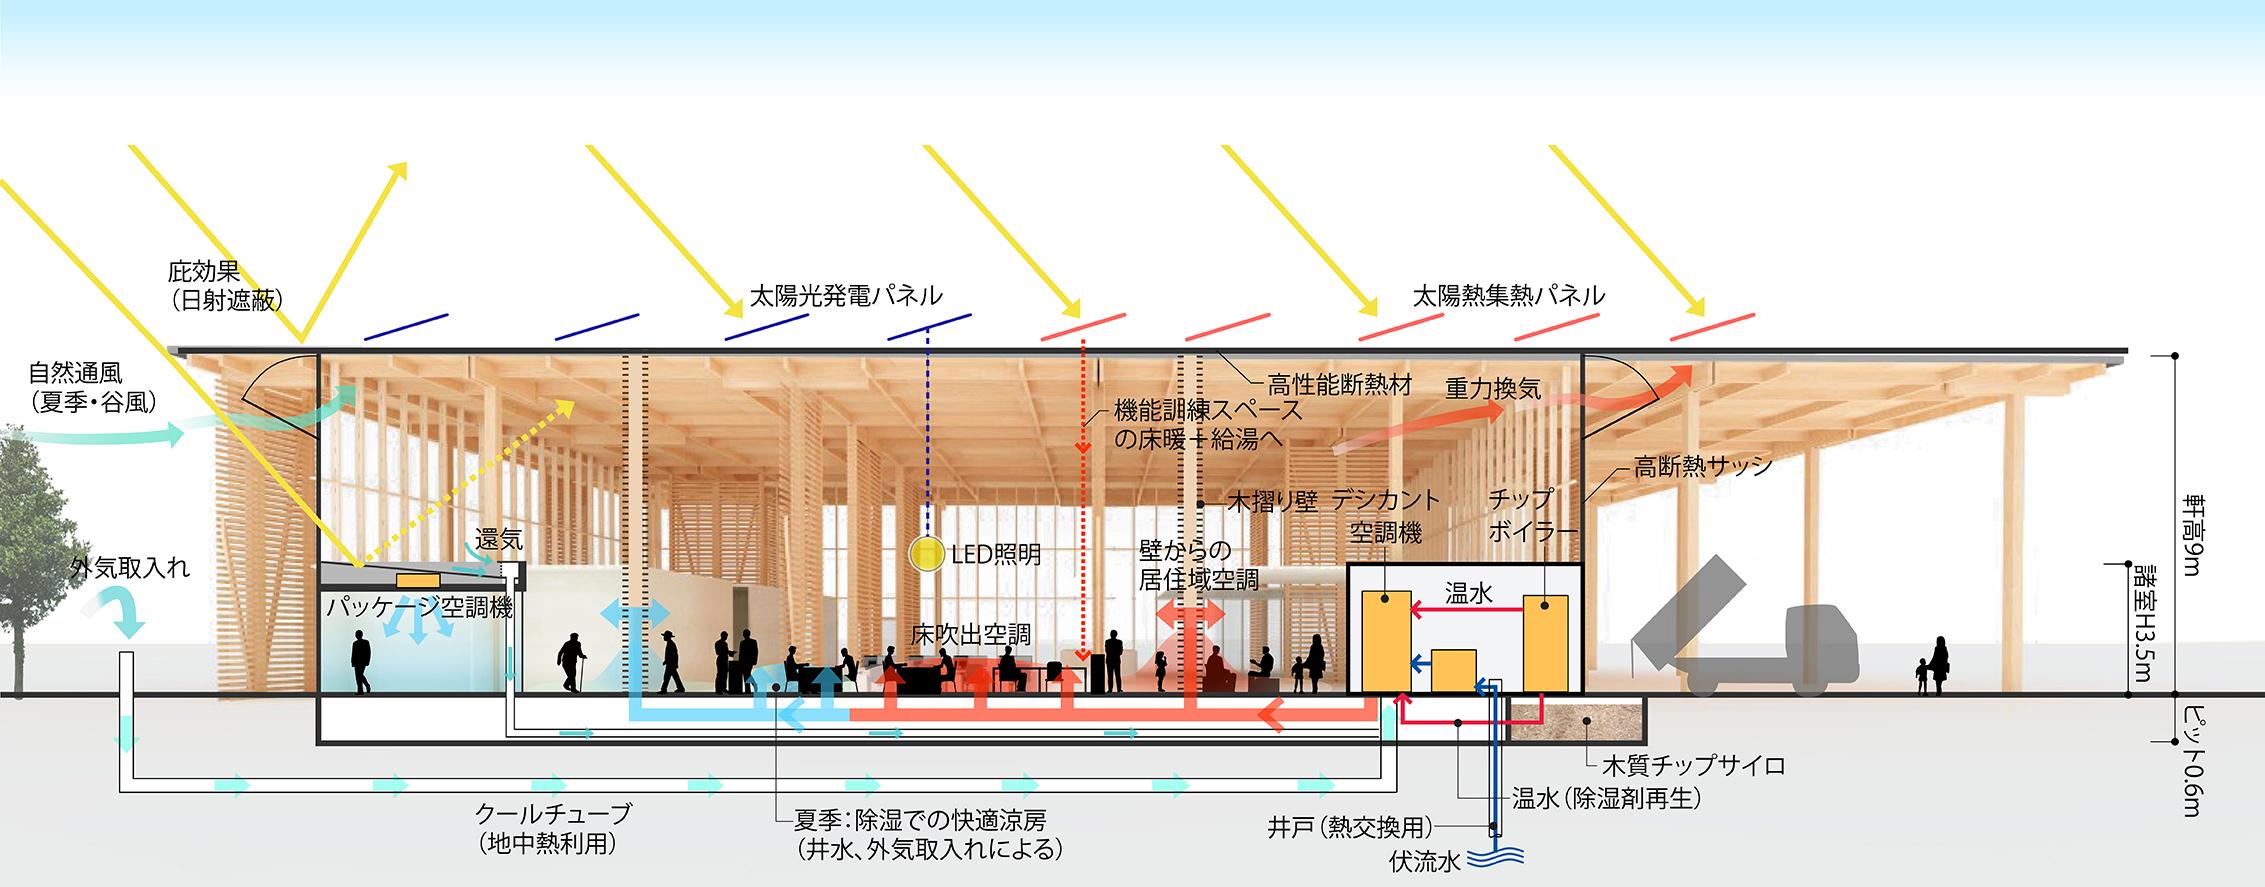 3-04_section.jpg